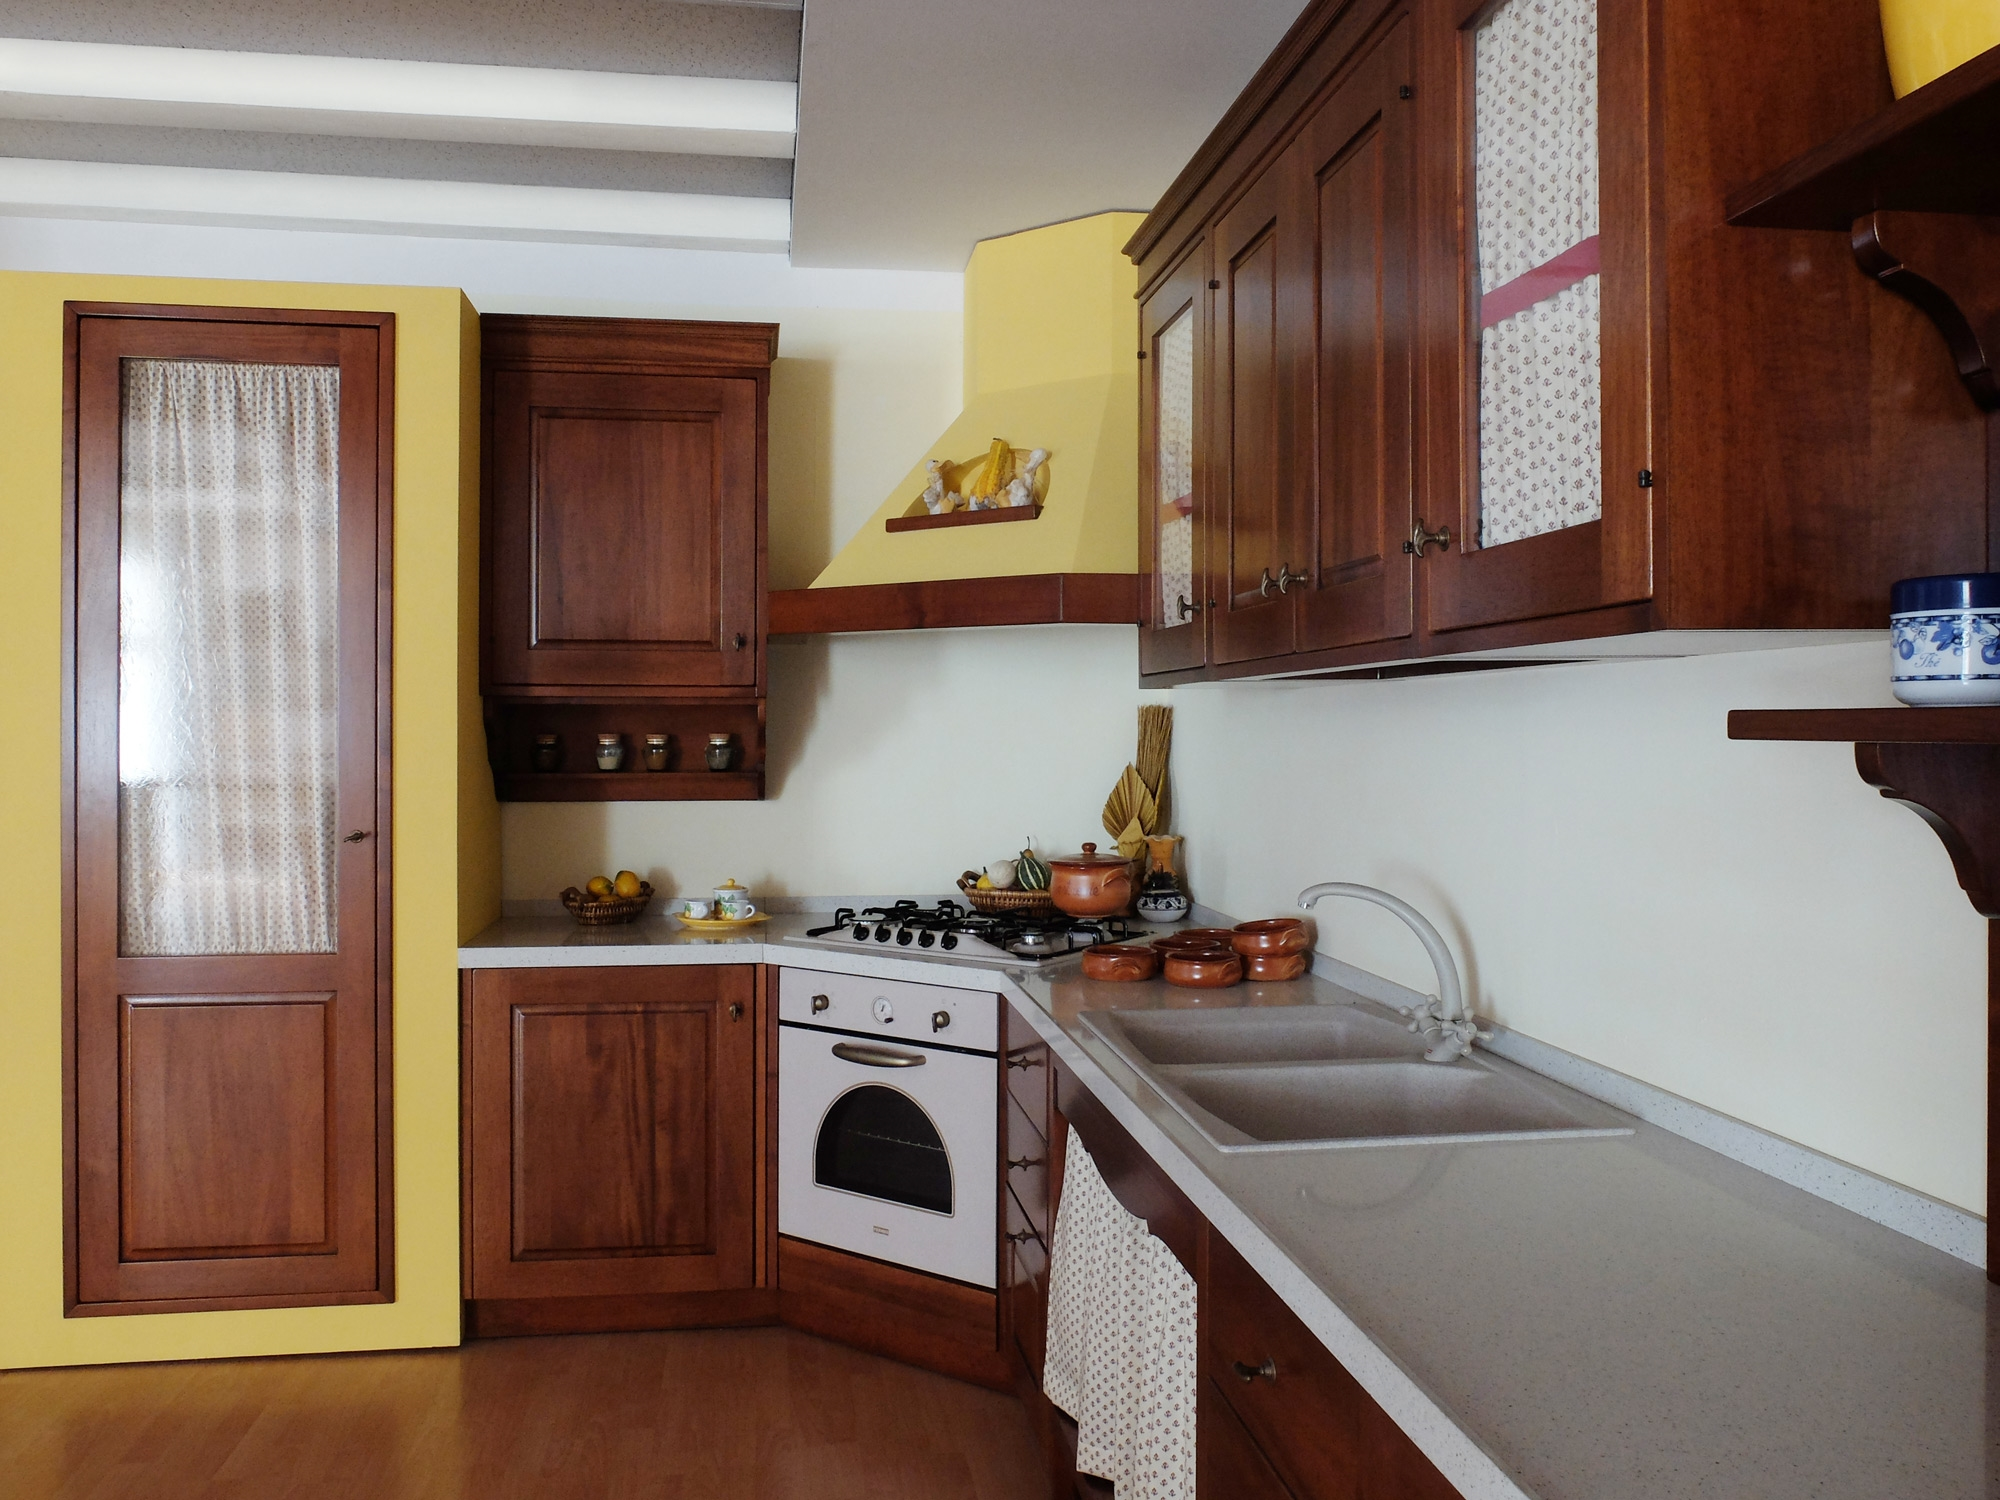 Cucina in legno noce massiccio con struttura in finta muratura cucine a prezzi scontati - Cucina finta muratura ikea ...